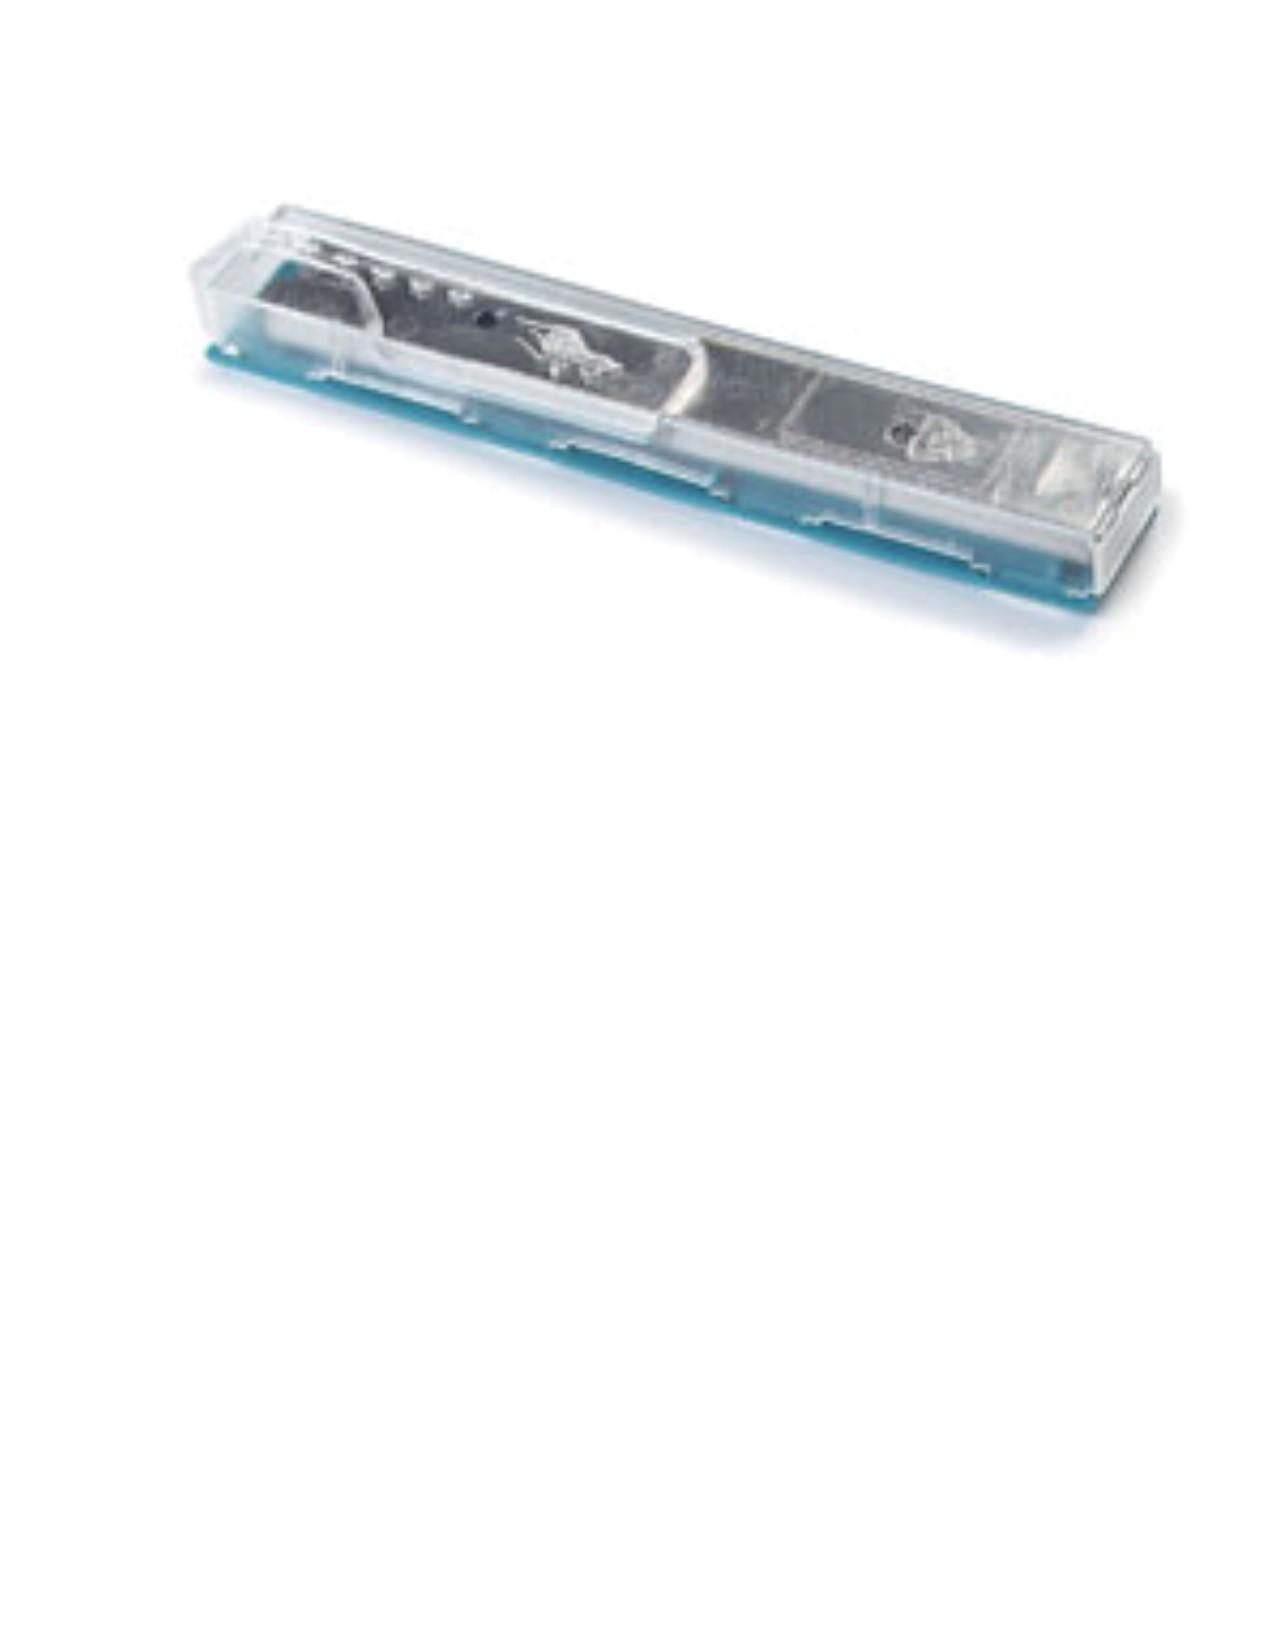 2905-96 Scraper Blades 4